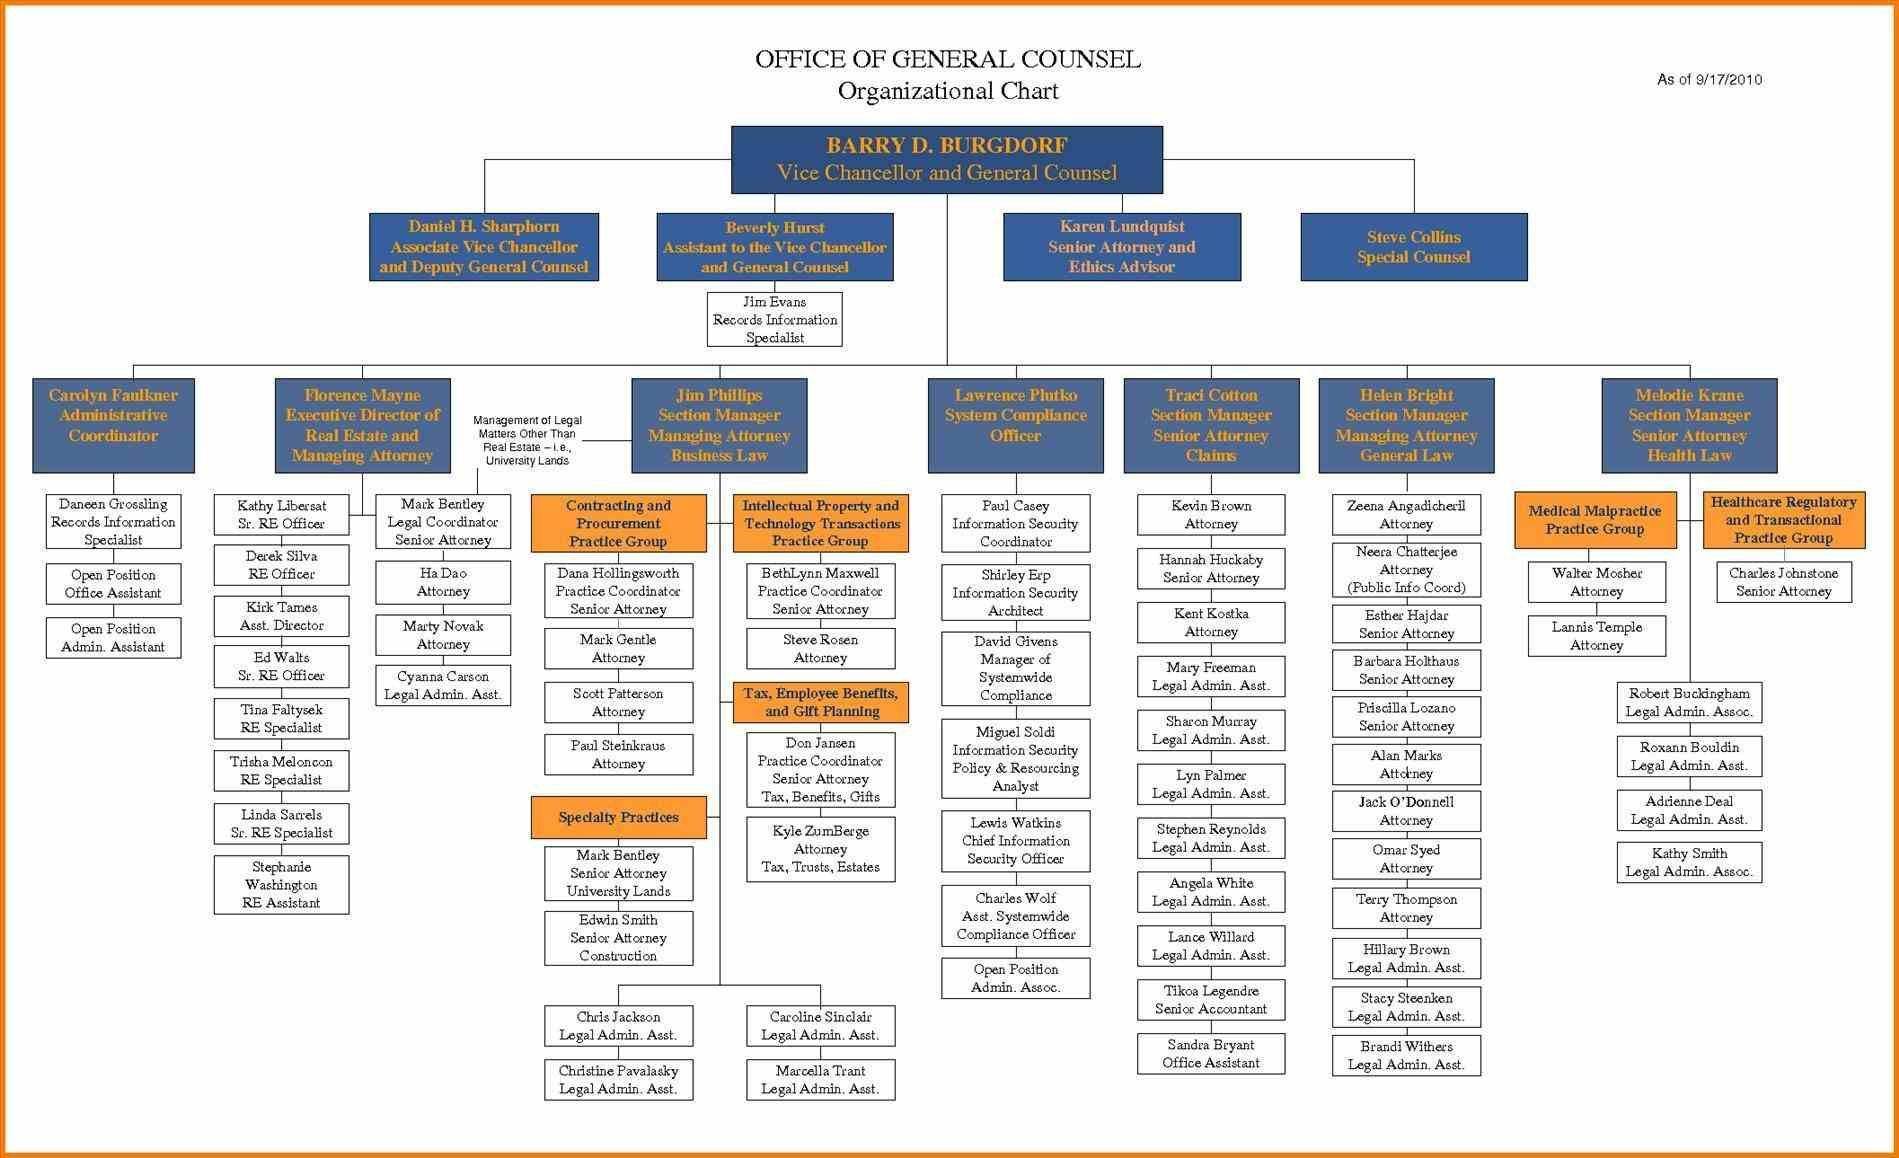 005 Best Organization Chart Template Excel 2010 Photo  Org OrganizationalFull